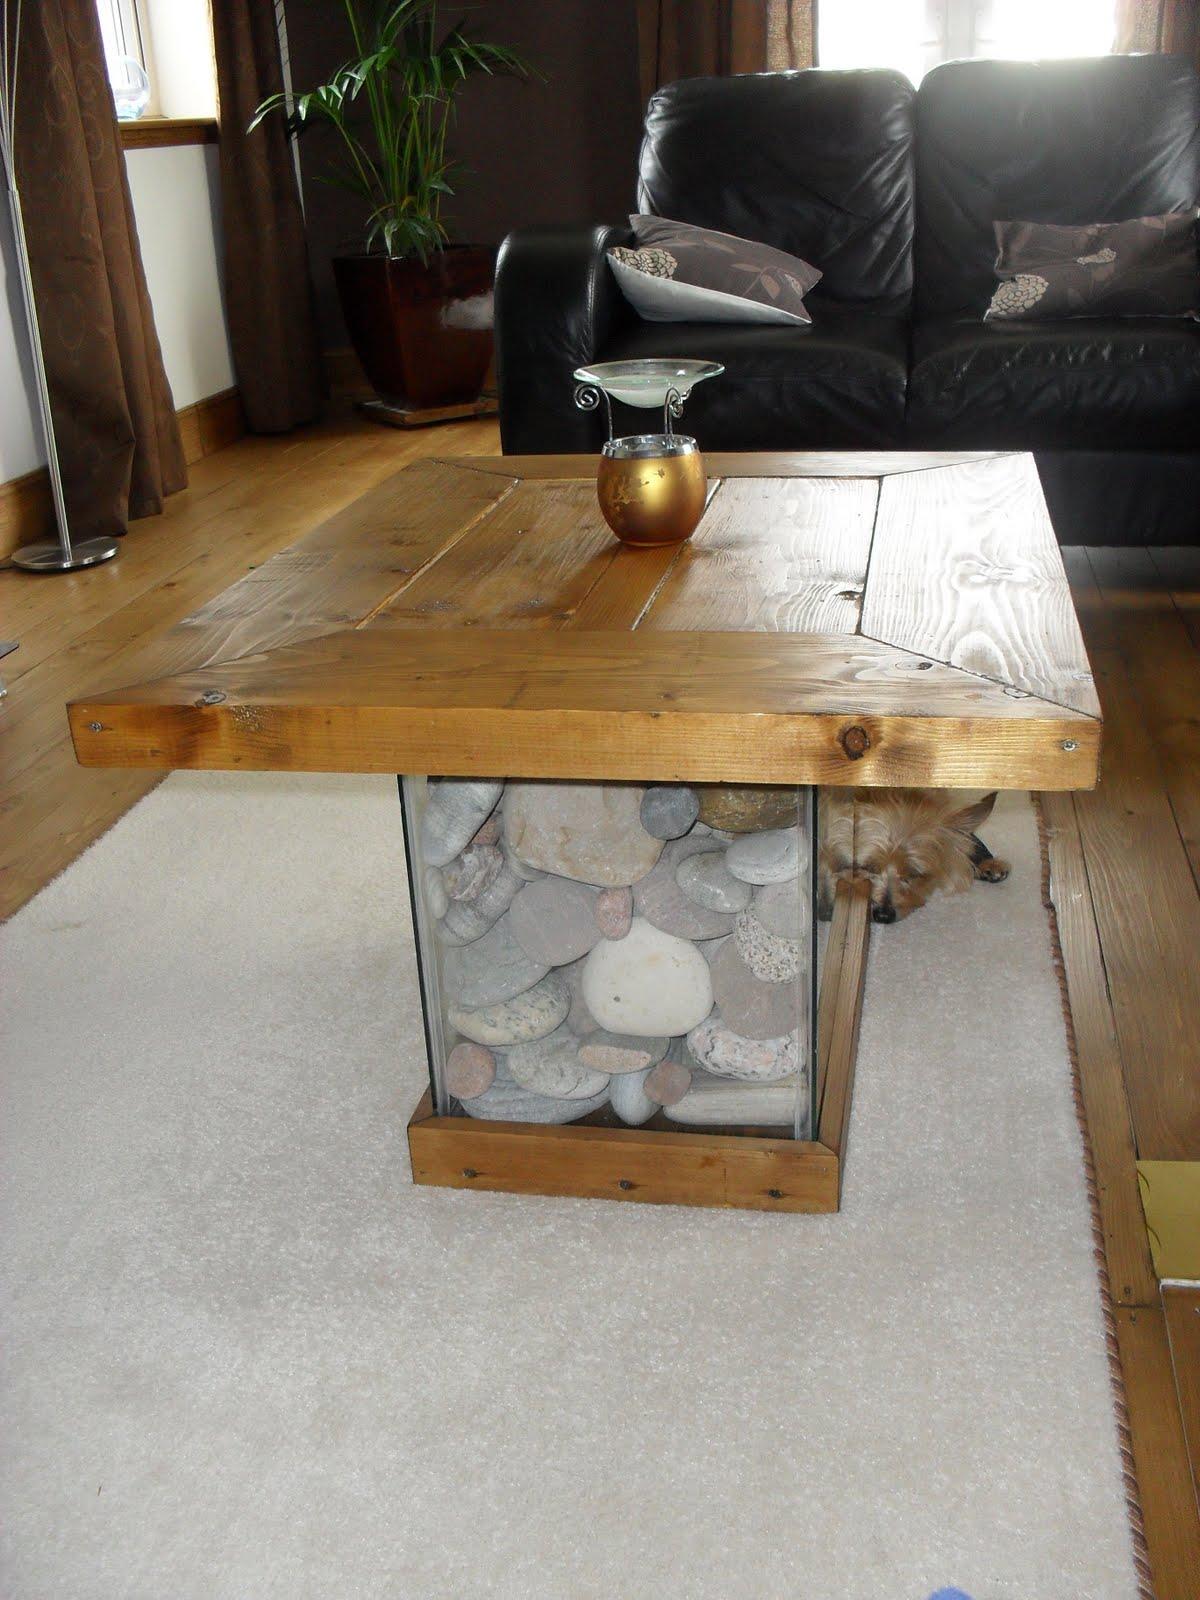 Aquarium Fish Tank Coffee Table Made of Wood